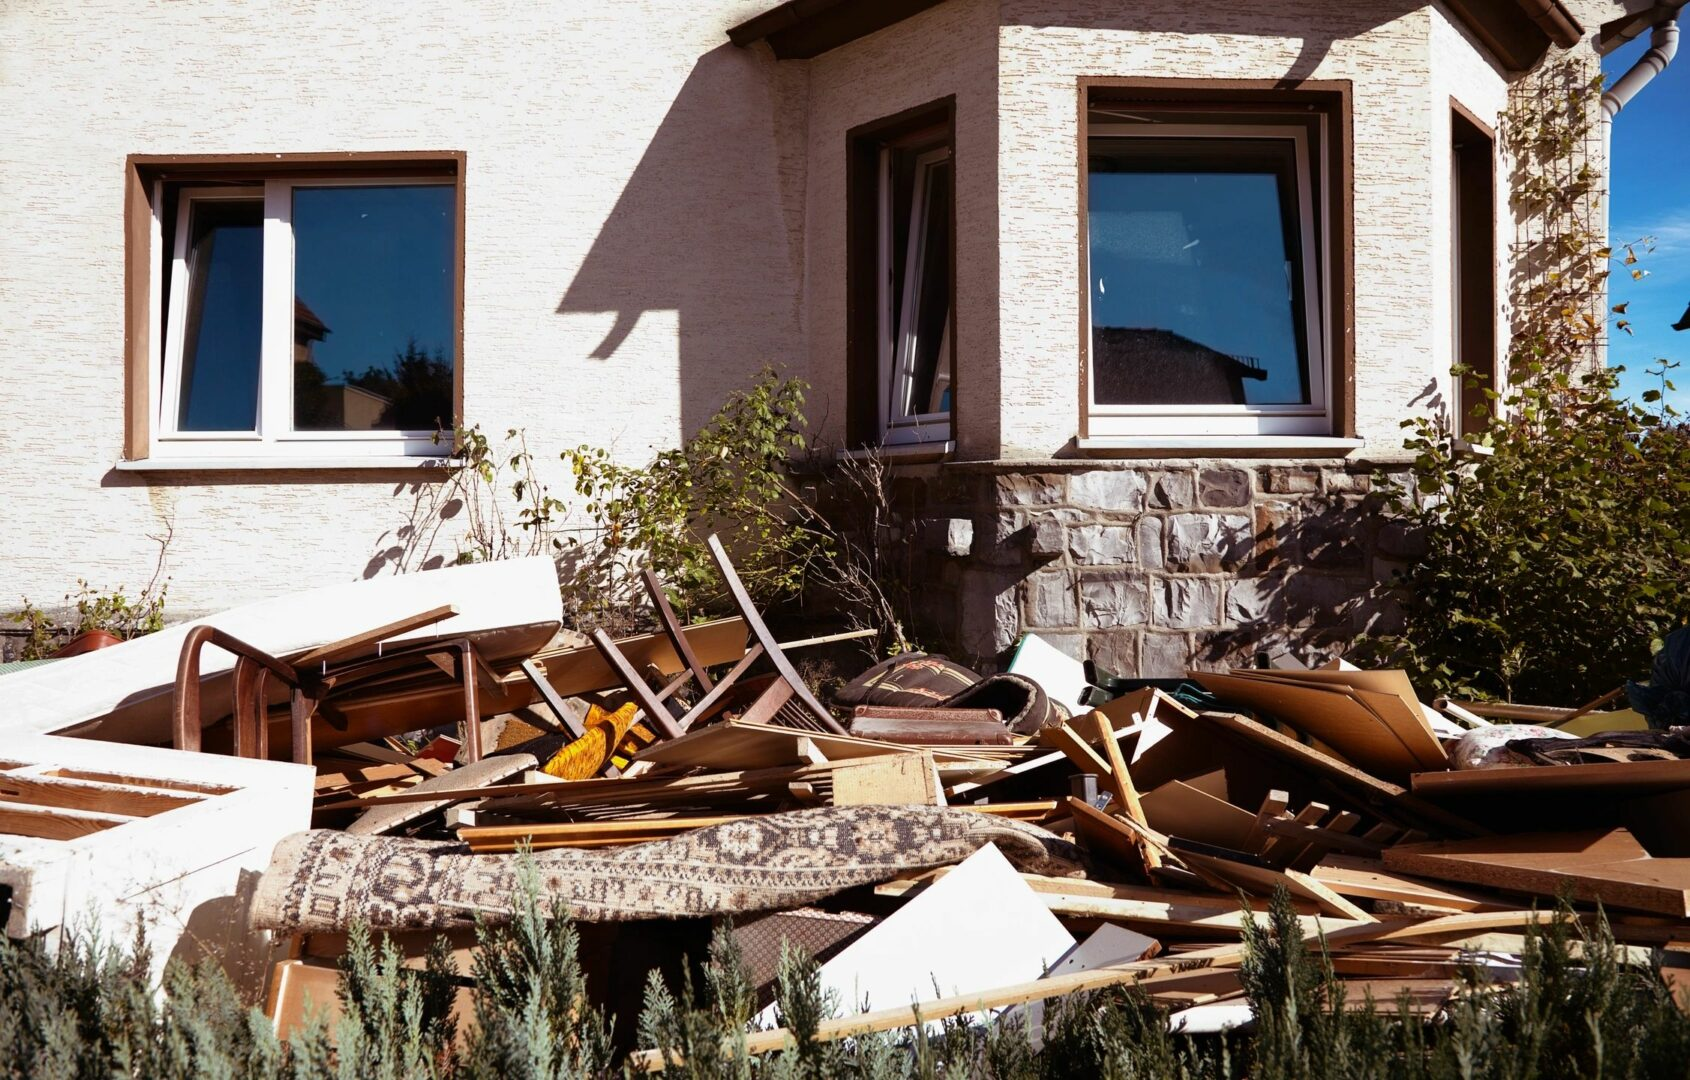 Property insurance documentation photography